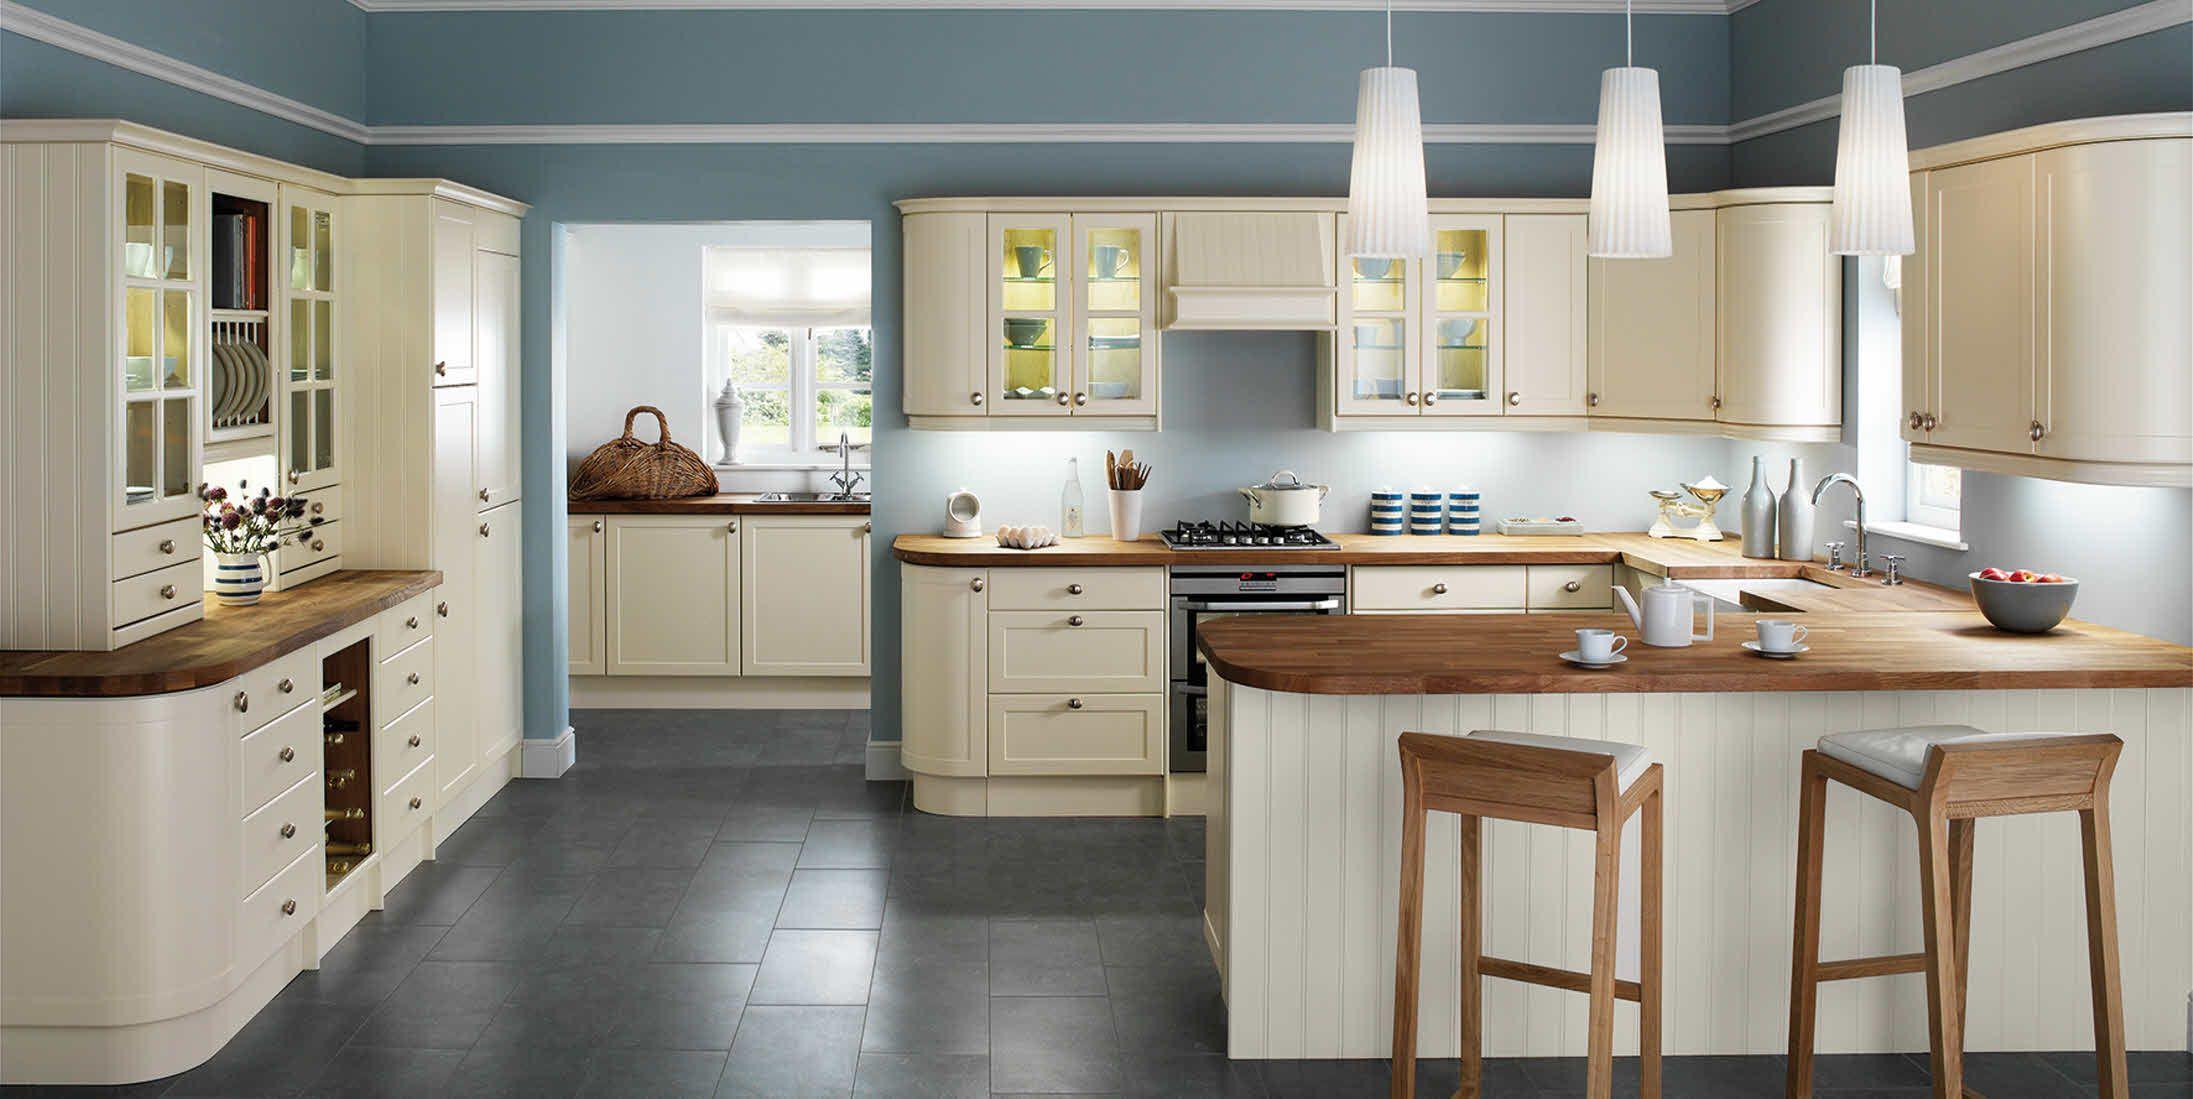 shaker kitchen cabinets Kitchen cabinets